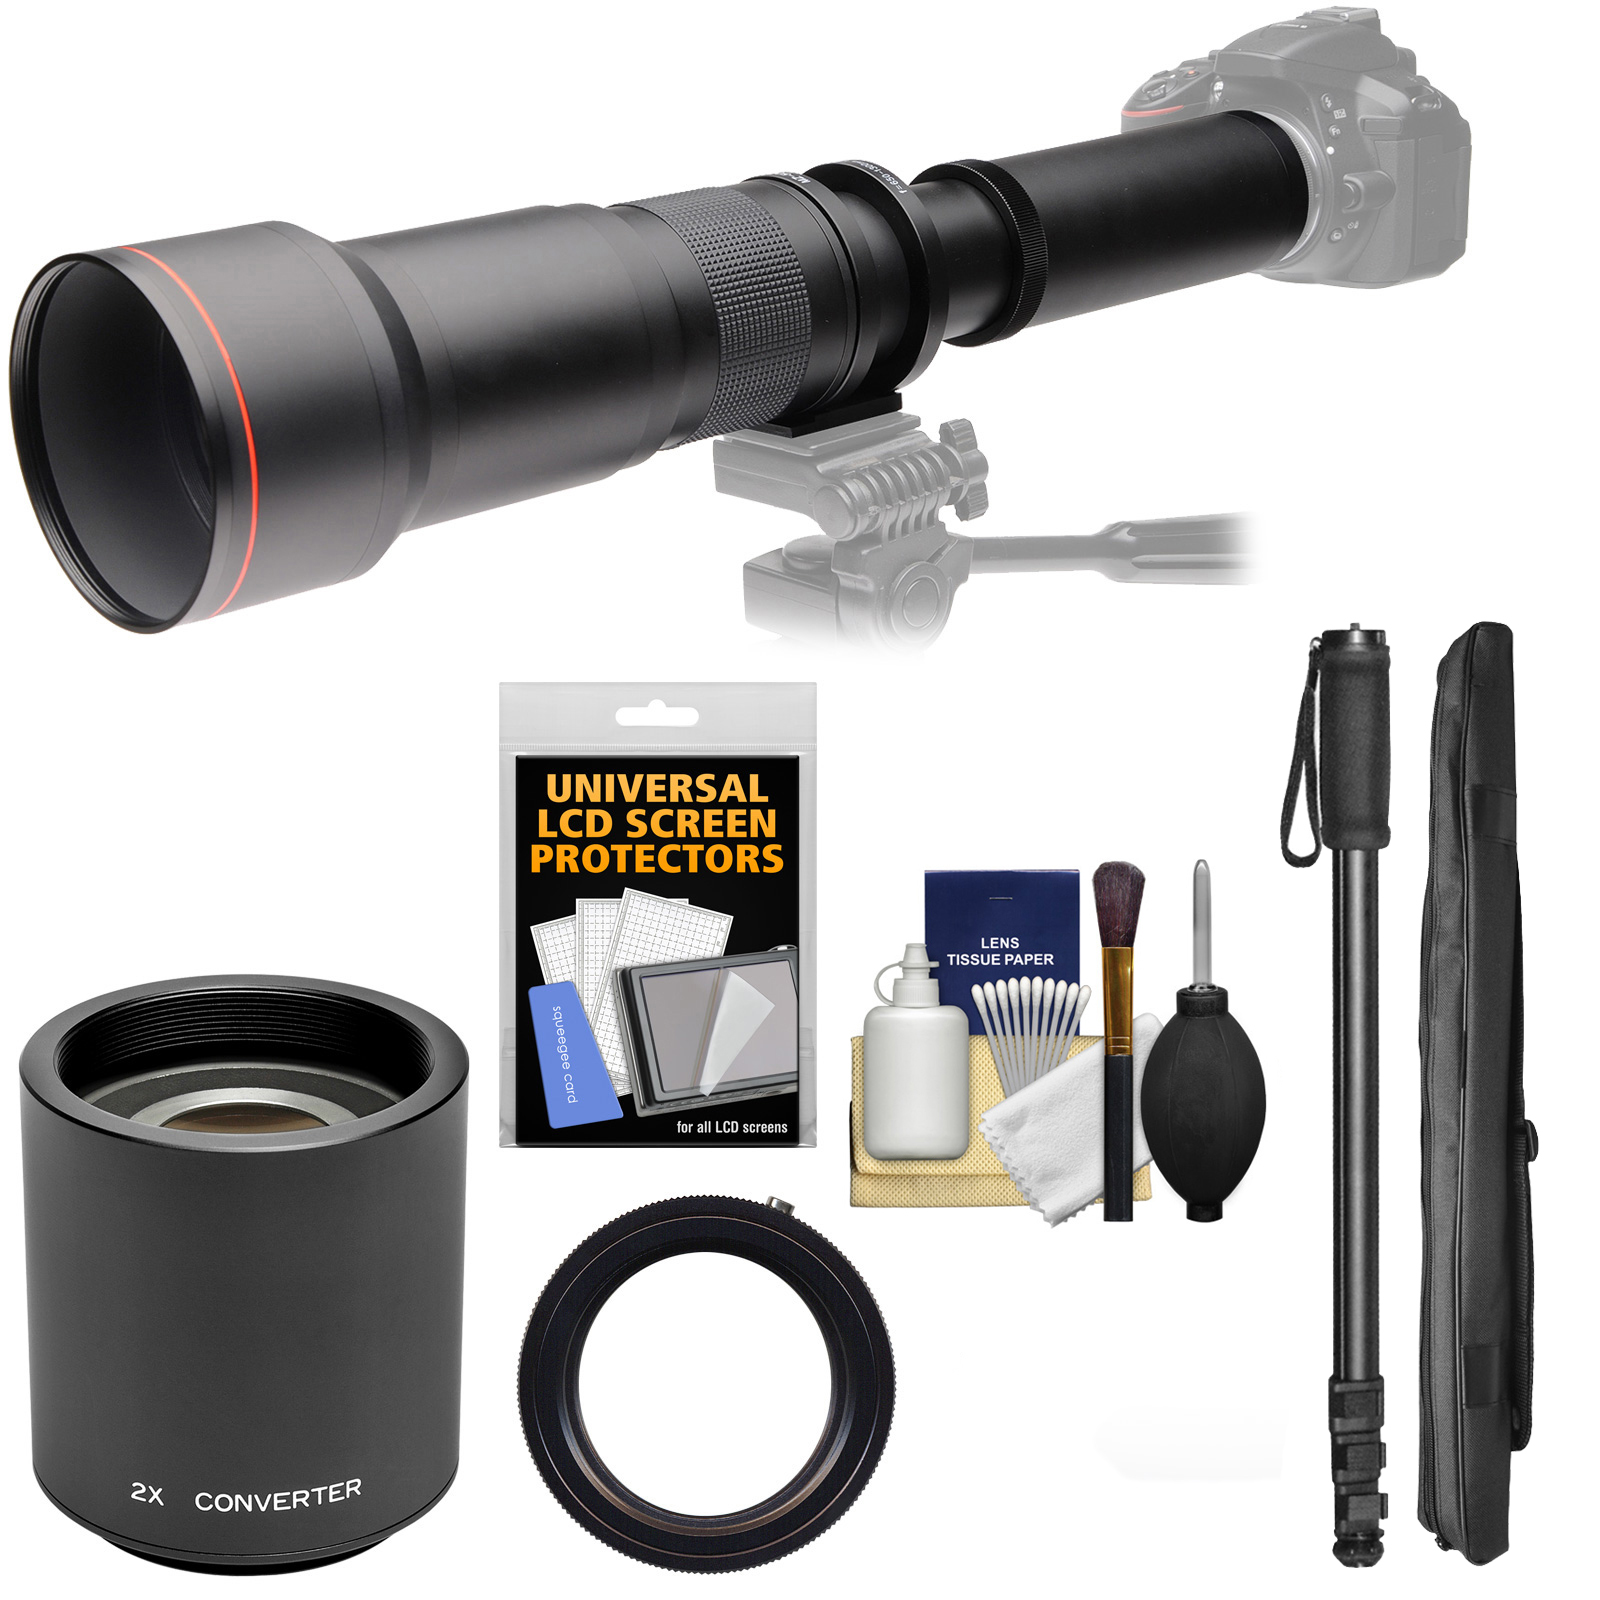 Vivitar 650-1300mm f/8-16 Telephoto Lens with 2x Teleconverter (=2600mm) + Monopod + Kit for Nikon Digital SLR Cameras